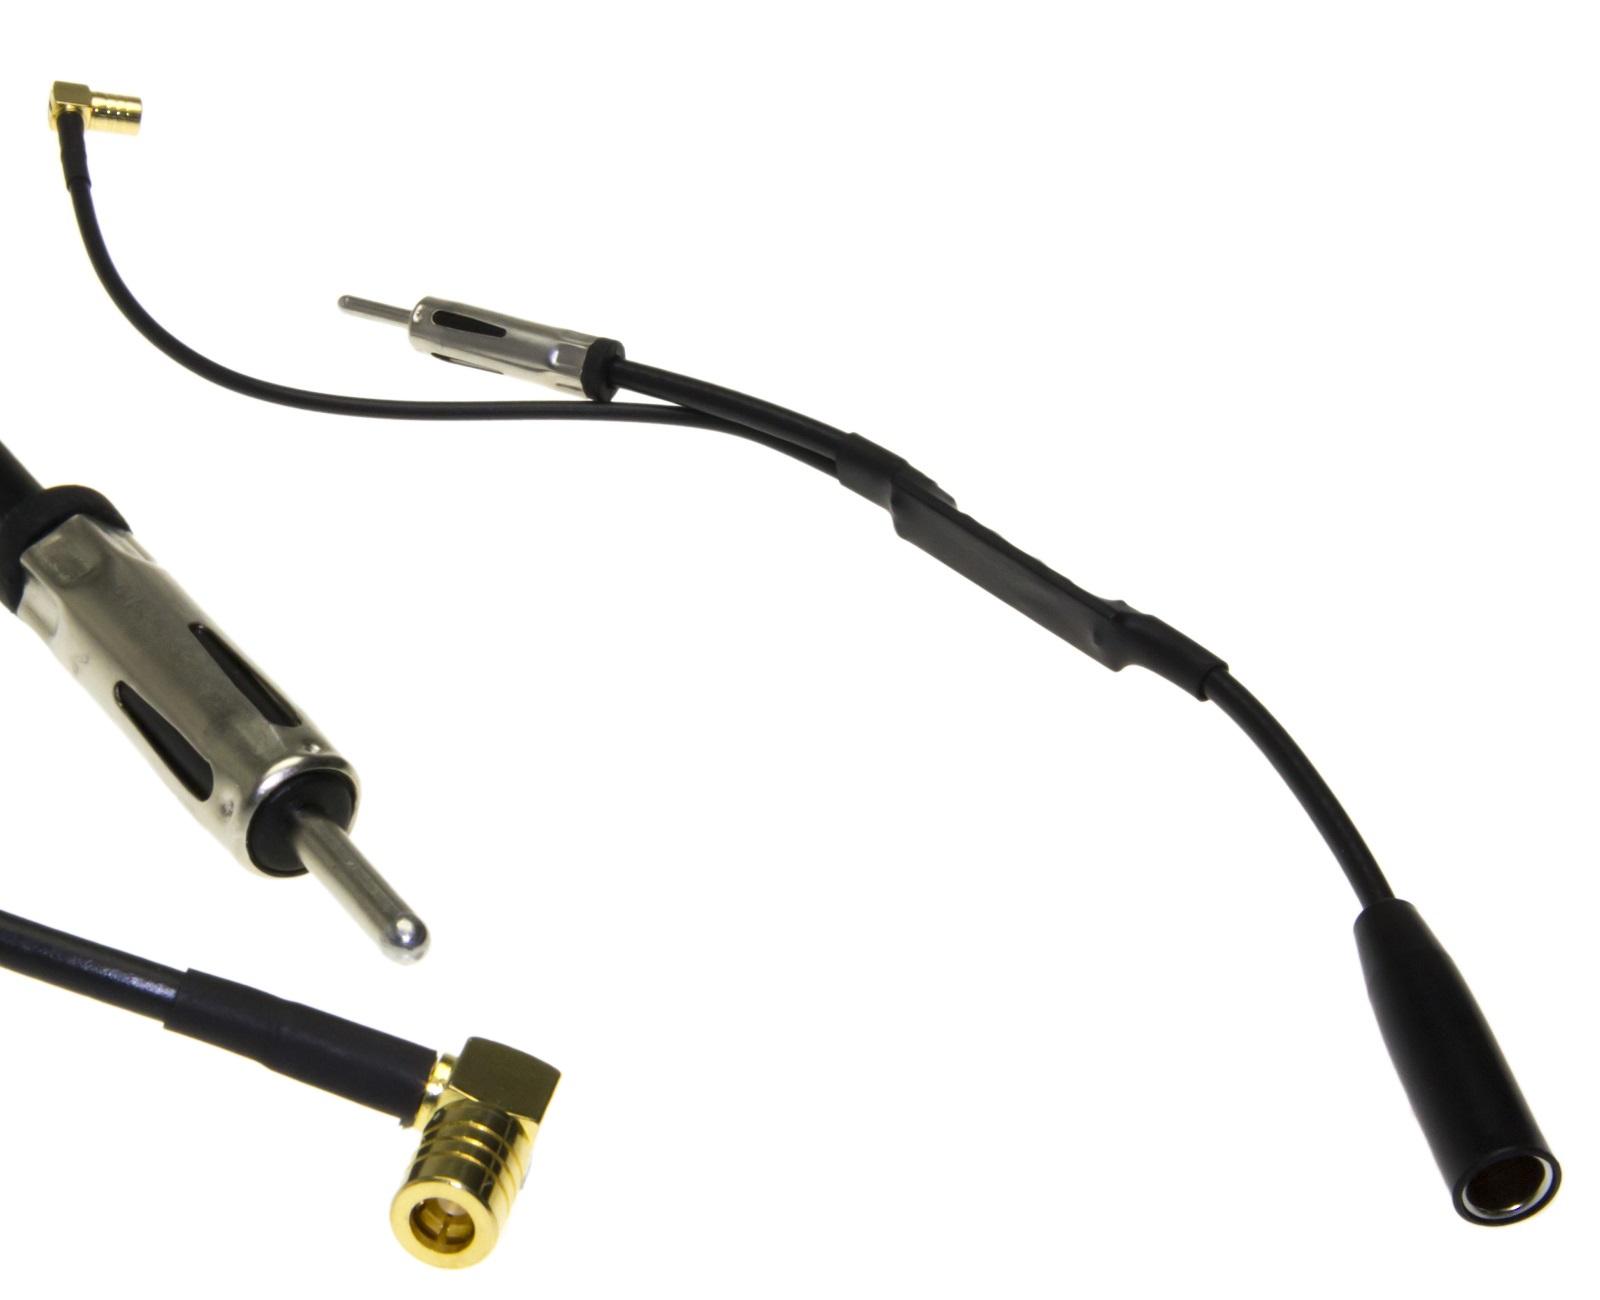 dab antenne adaptateur splitter pour autoradio jvc. Black Bedroom Furniture Sets. Home Design Ideas